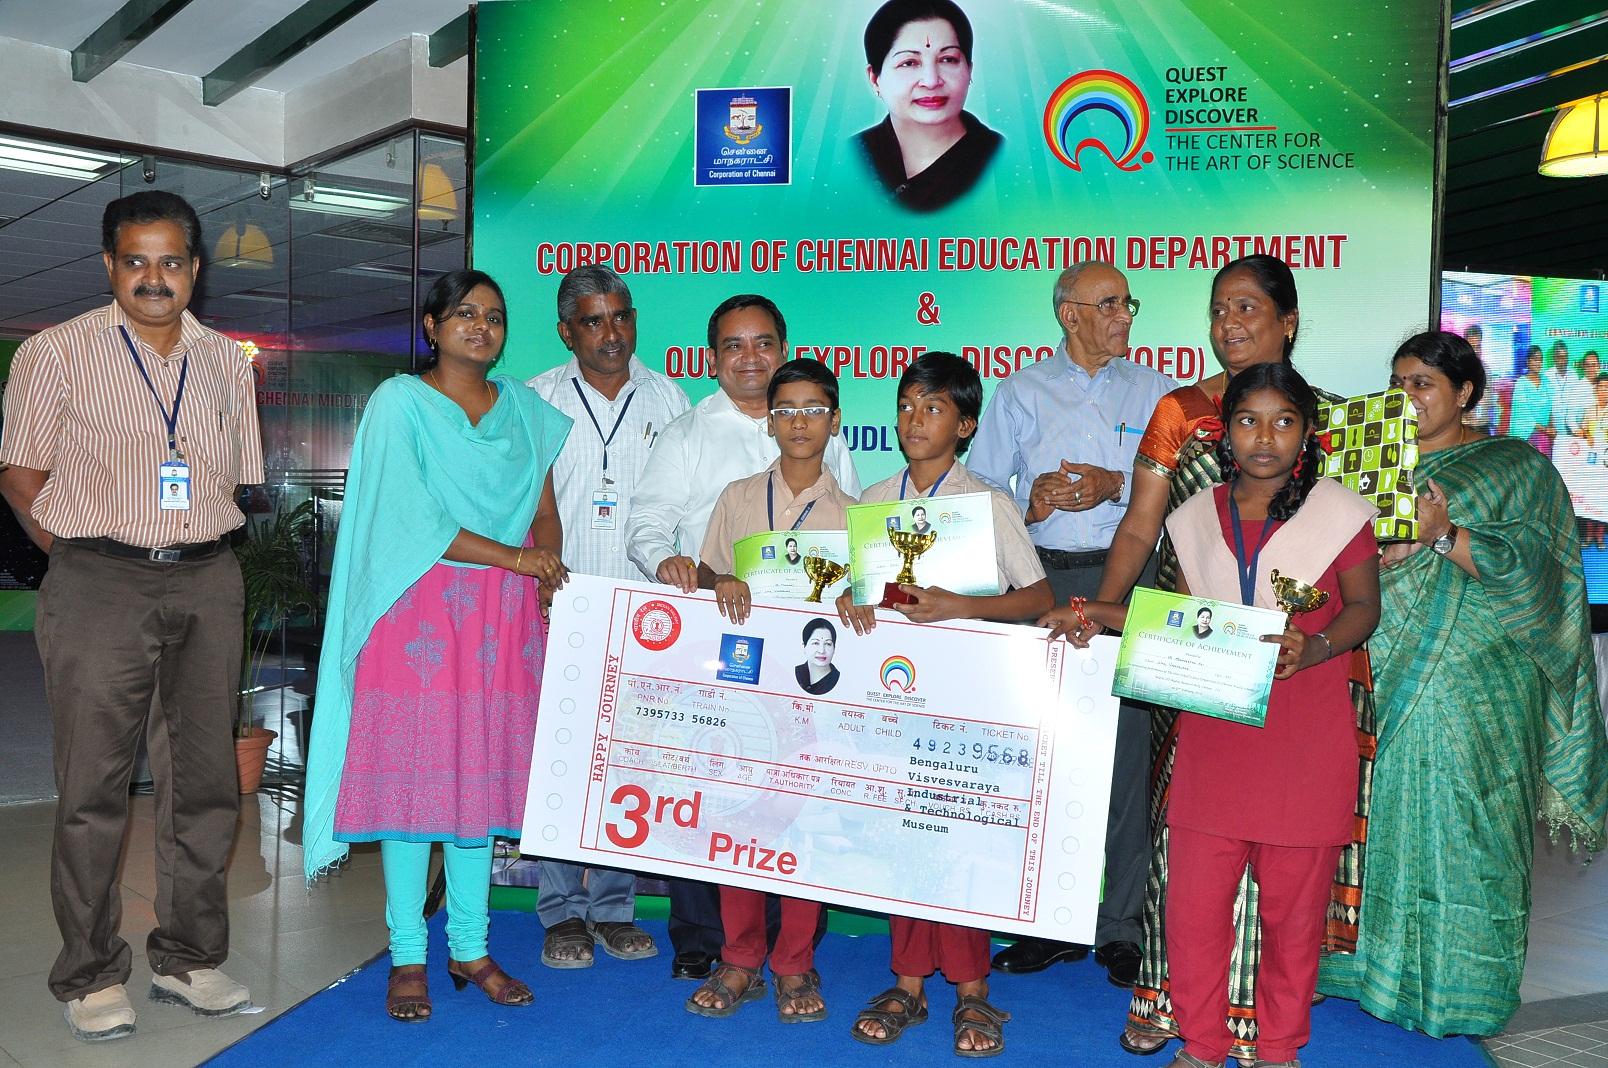 3rd Prize: CMS Vadapalani - A. Ramana 6th, S. Mohan Raj 7th, S. Sangeetha Sri 8th, With Qed Everest Edusis& Solutions Pvt Ltd Chairman Mr.Krishana And Lalitha IAS